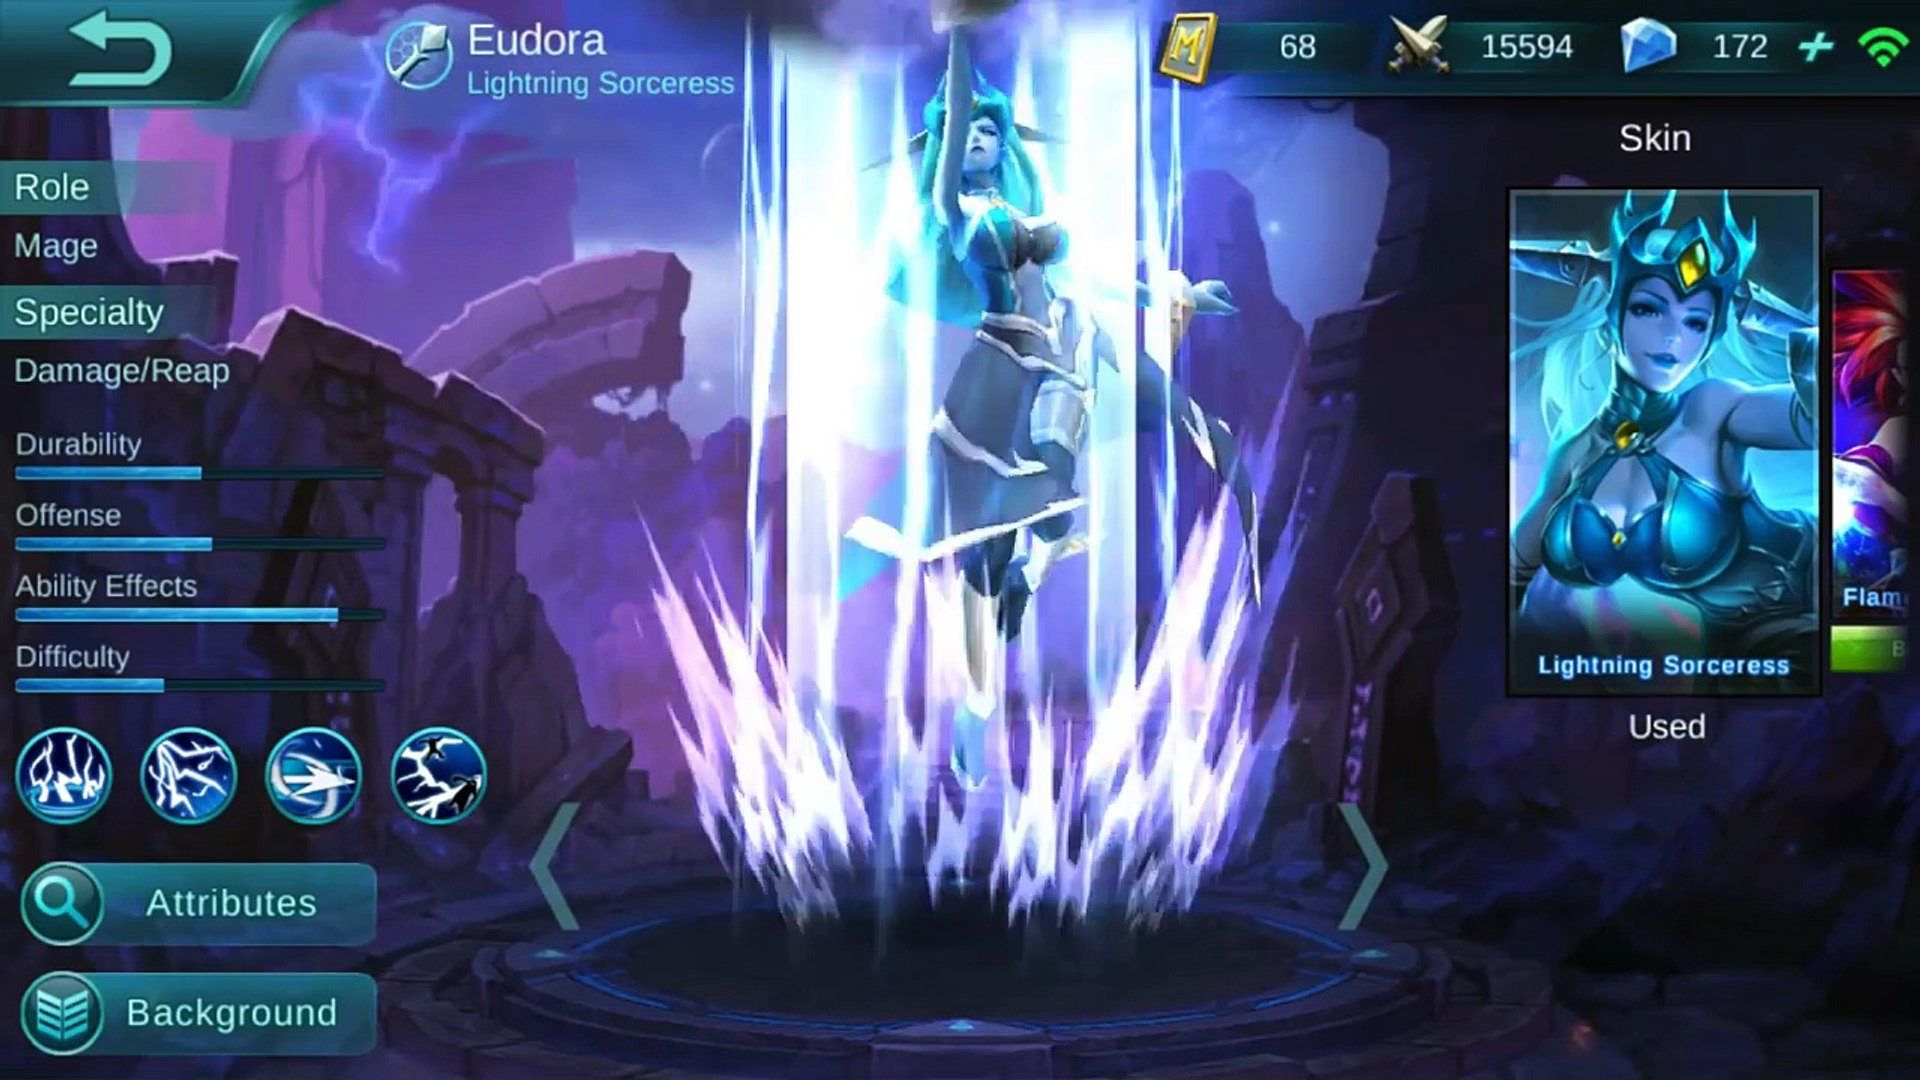 Mobile Legends EUDORA BEST BUILD High Elo Guide & Gameplay 9